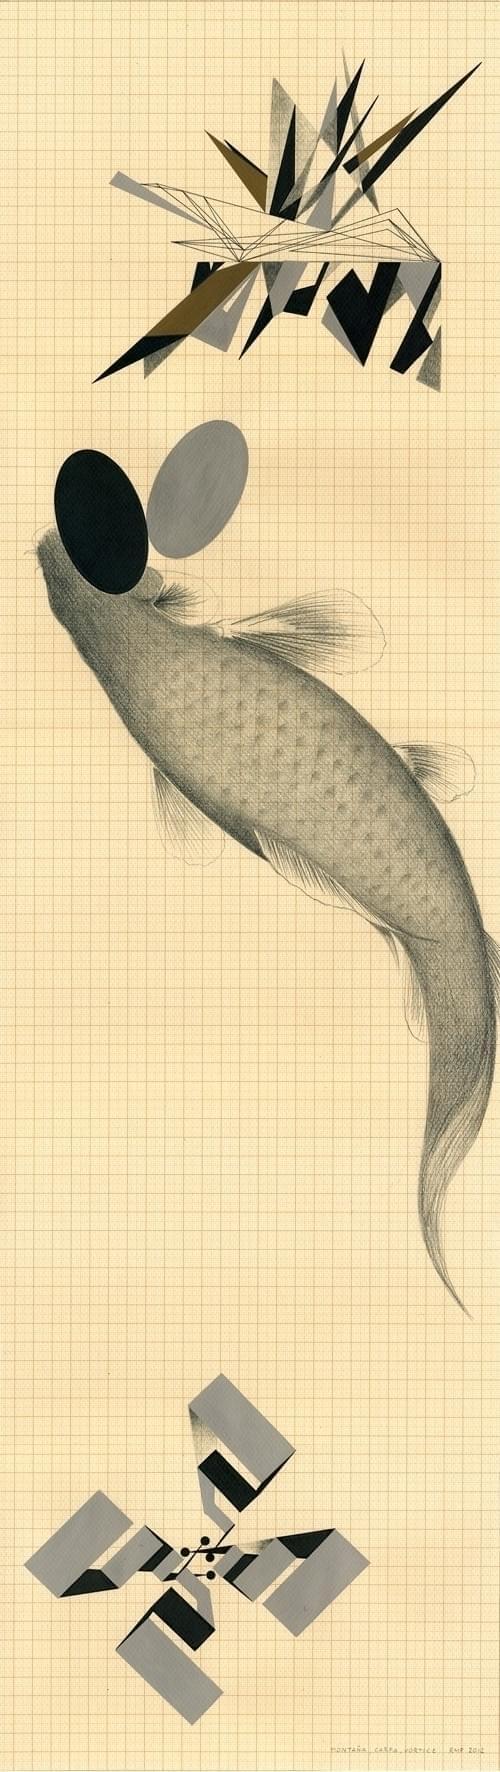 09-Montania, carpa, vortice